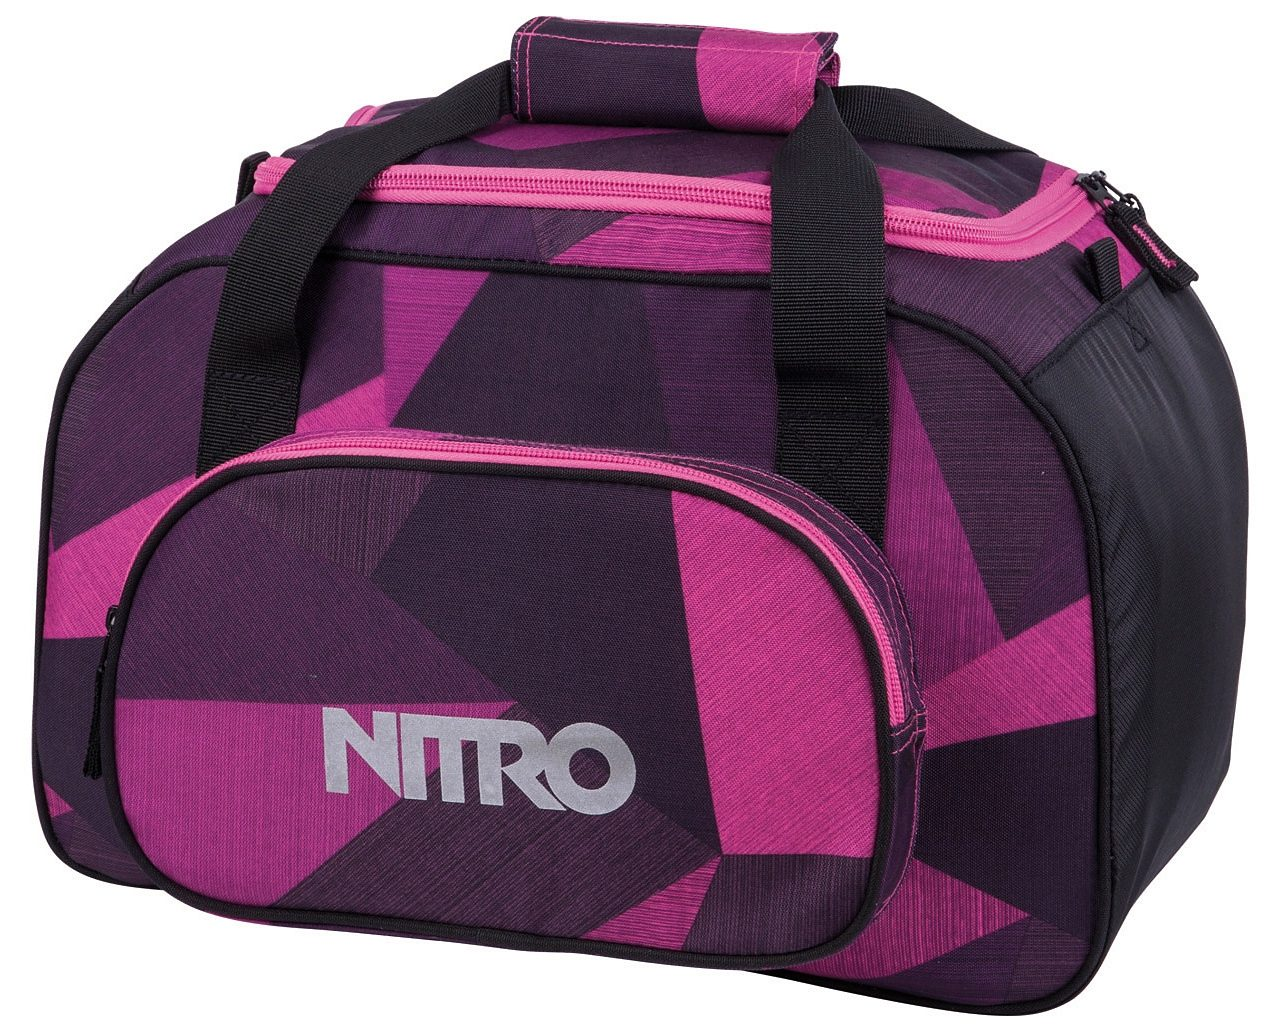 Nitro Reisetasche, »Duffle Bag XS- Fragments purple«